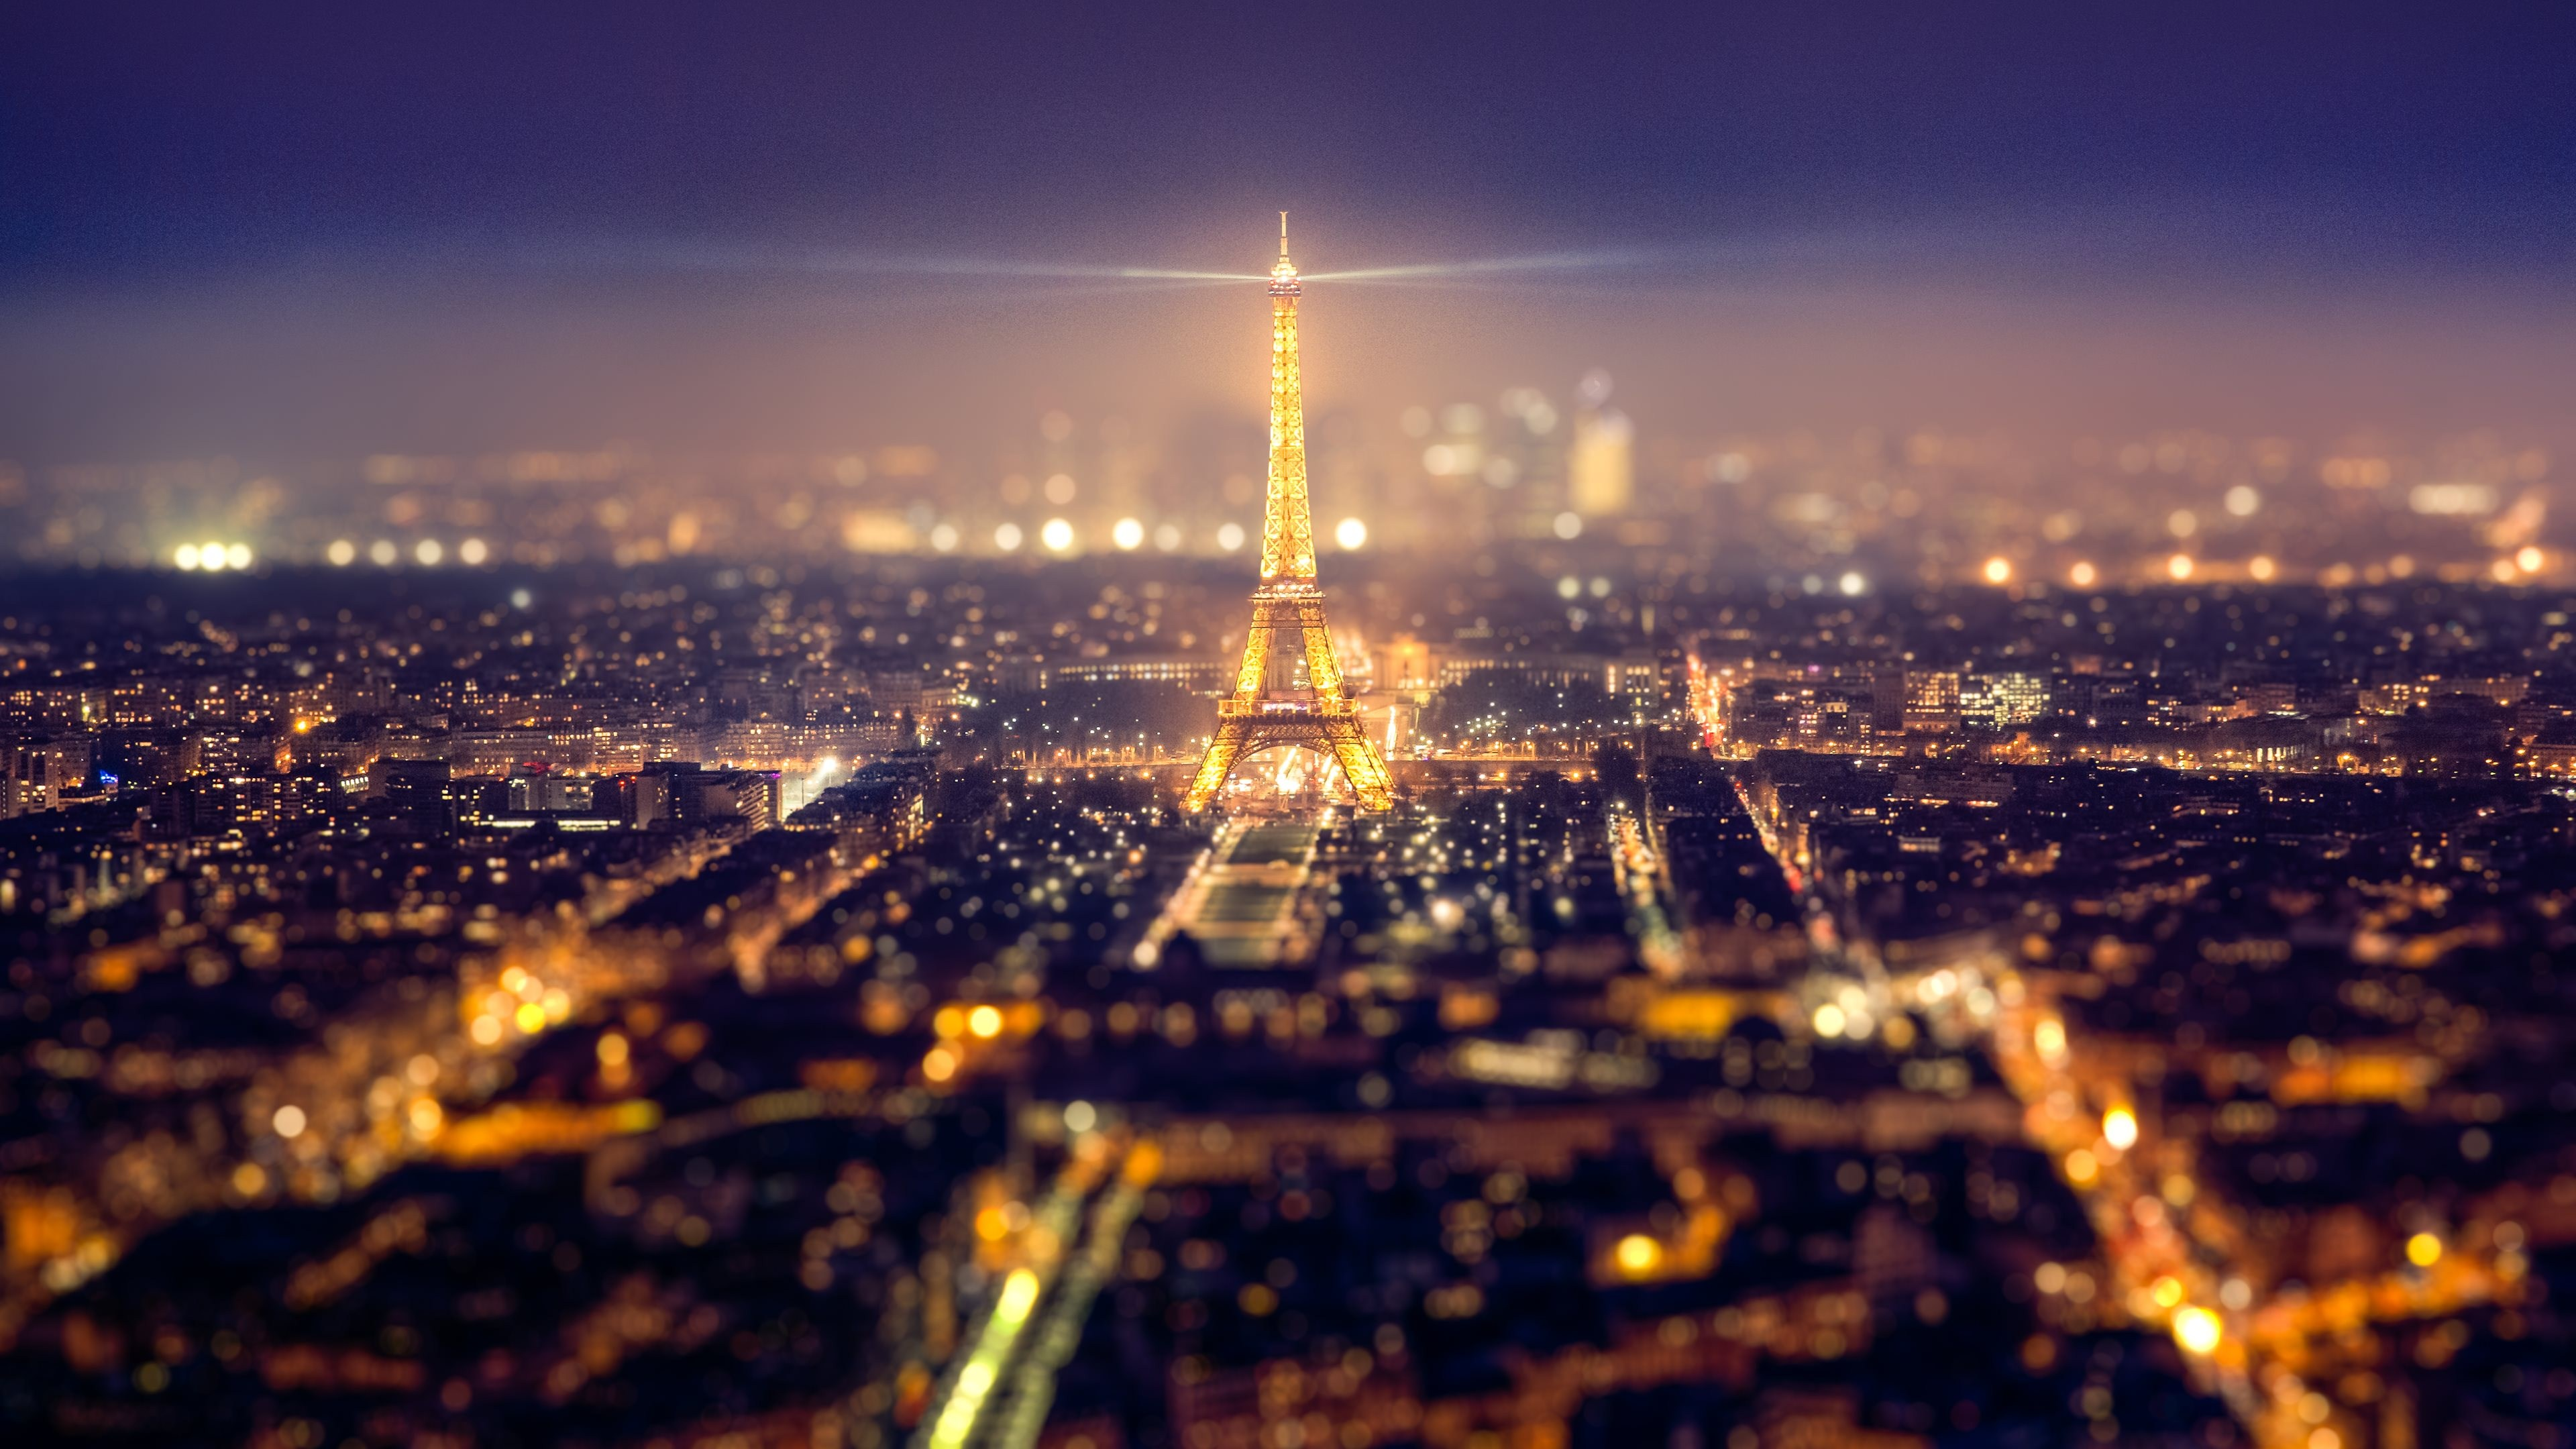 Hd wallpaper paris -  Paris Wallpaper